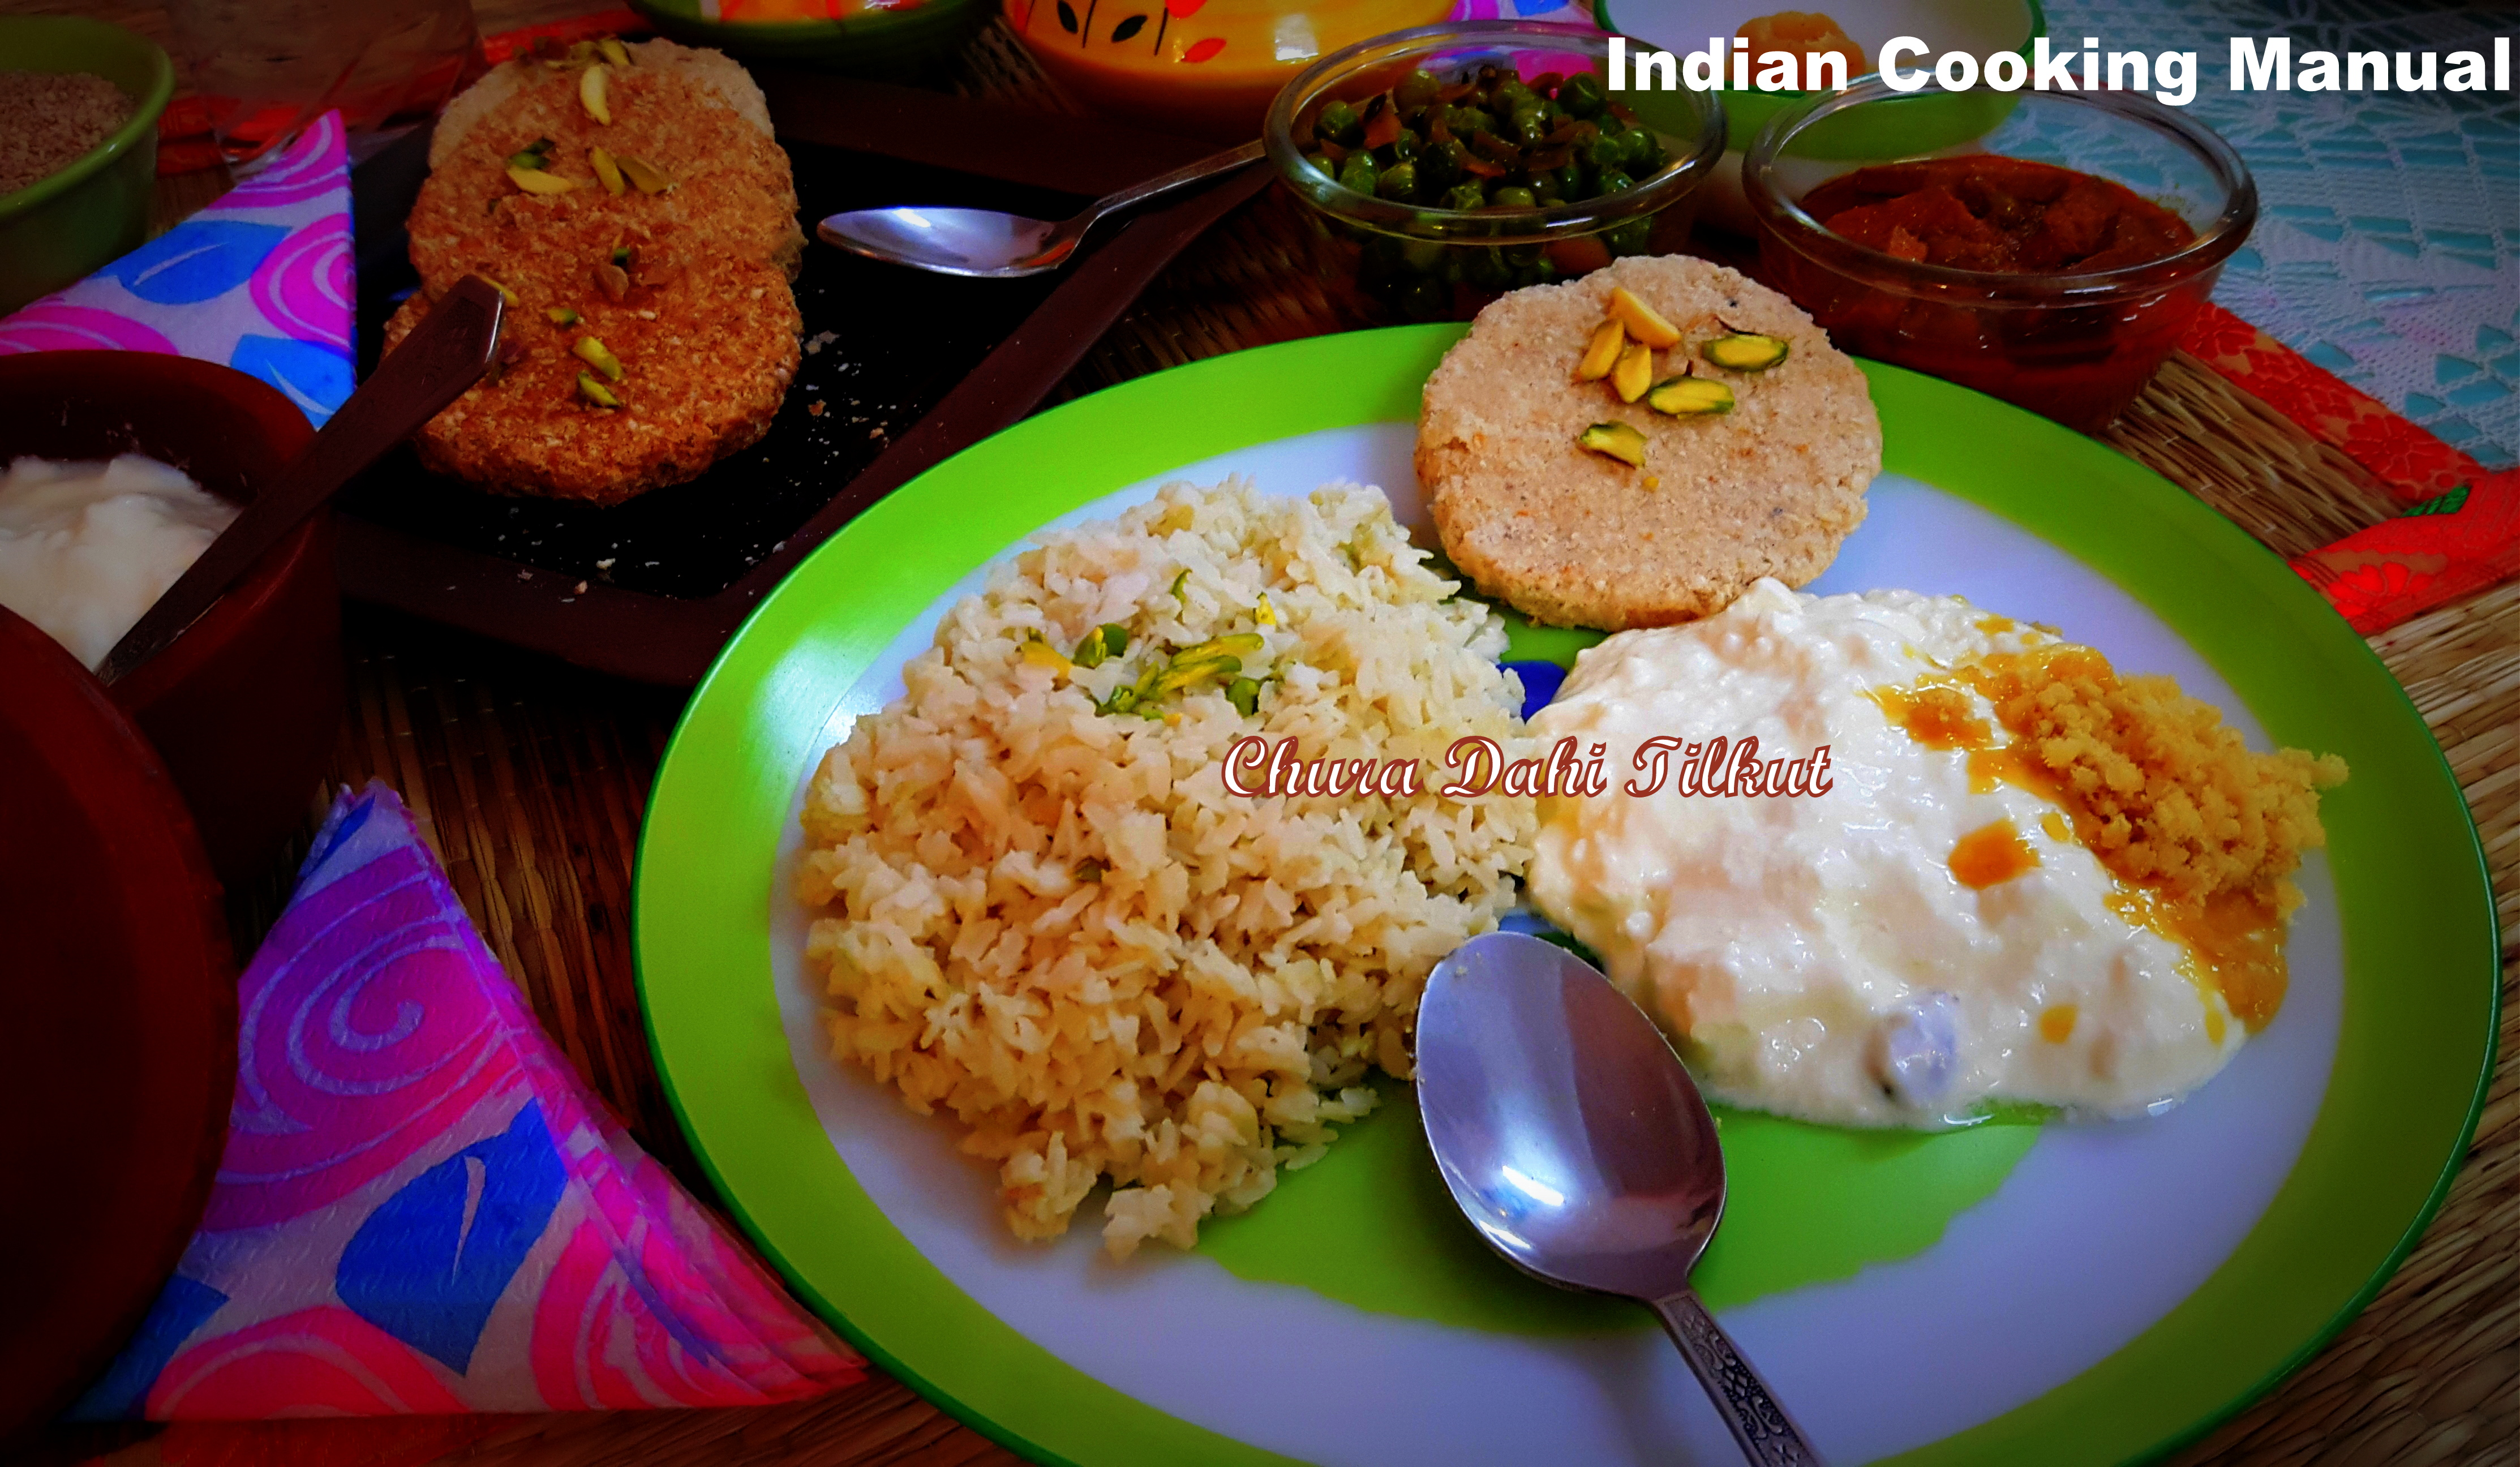 Chura Dahi Tilkut (Beaten Rice, Yogurt with pounded Sesame Sweet)